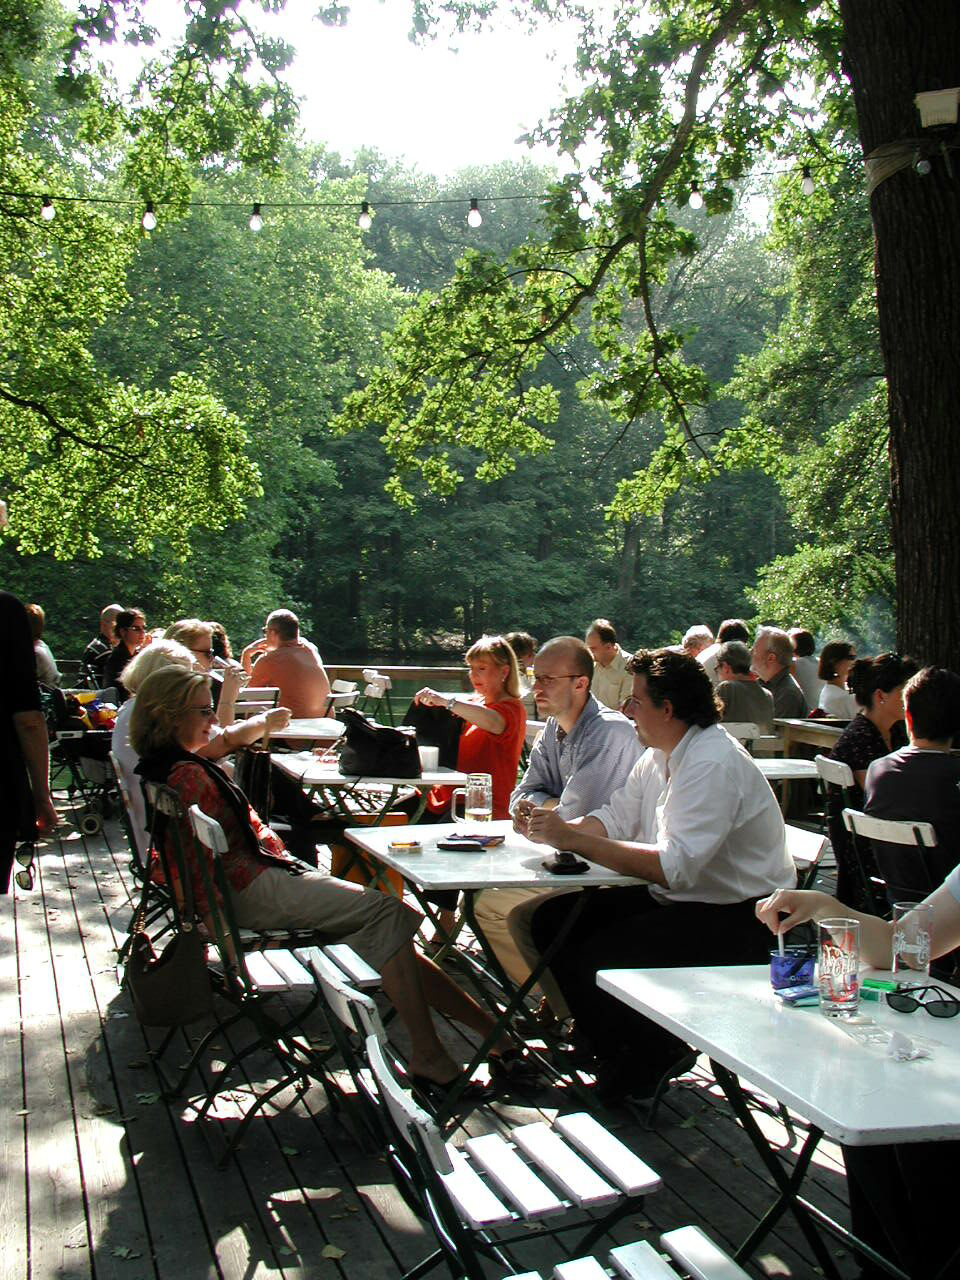 Cafe am neuen See, ╕ visitBerlin, Foto Tanja Koch.jpg